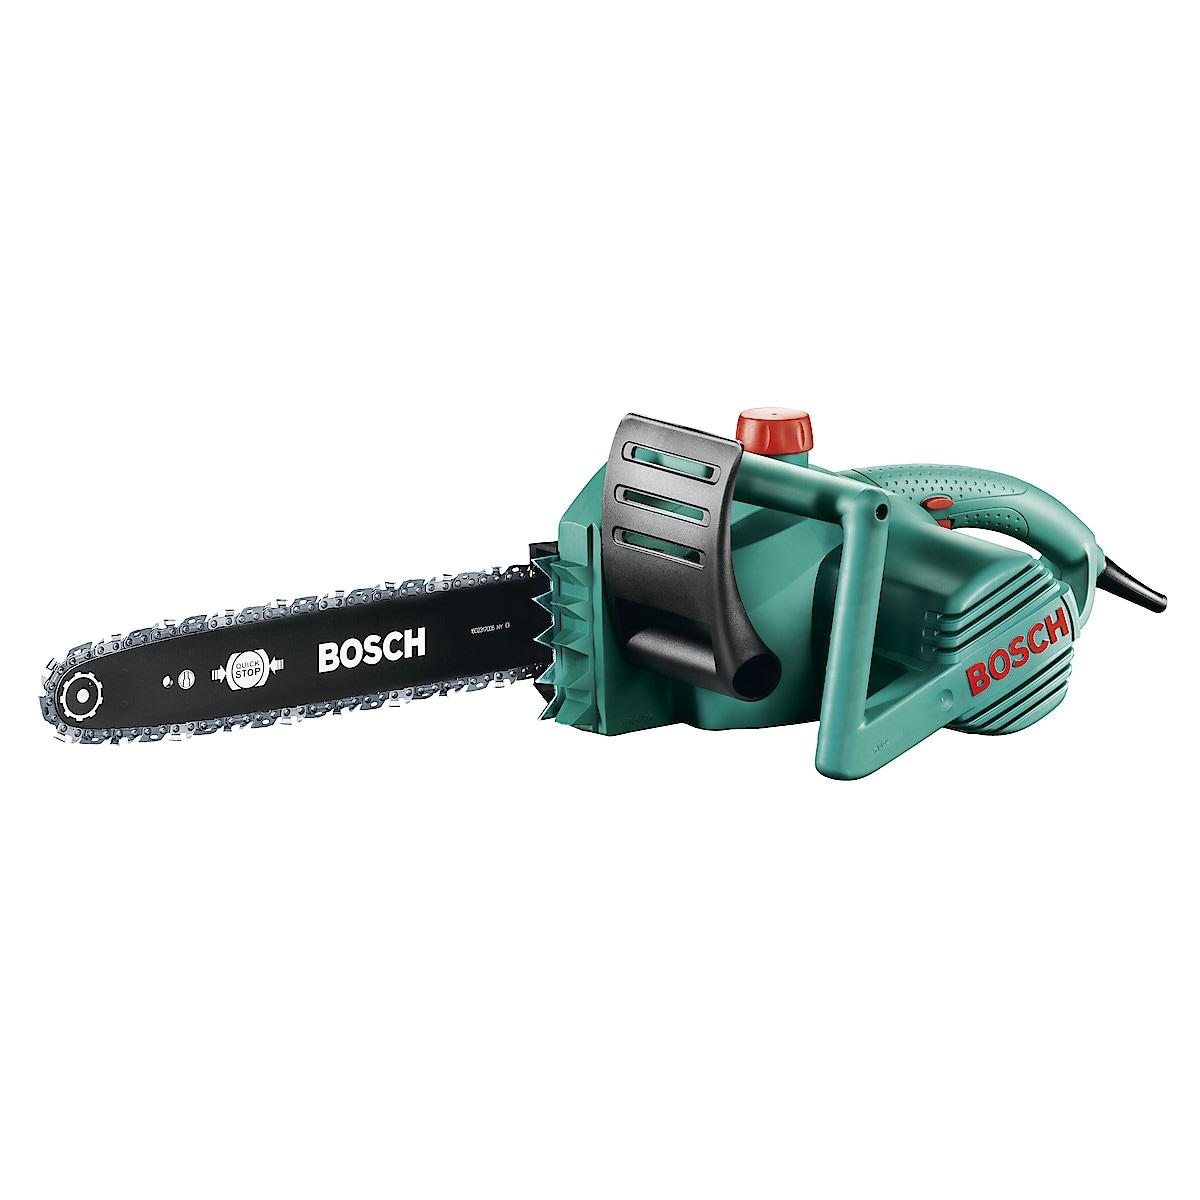 Bosch Keo 10,8V Li grensag | Clas Ohlson